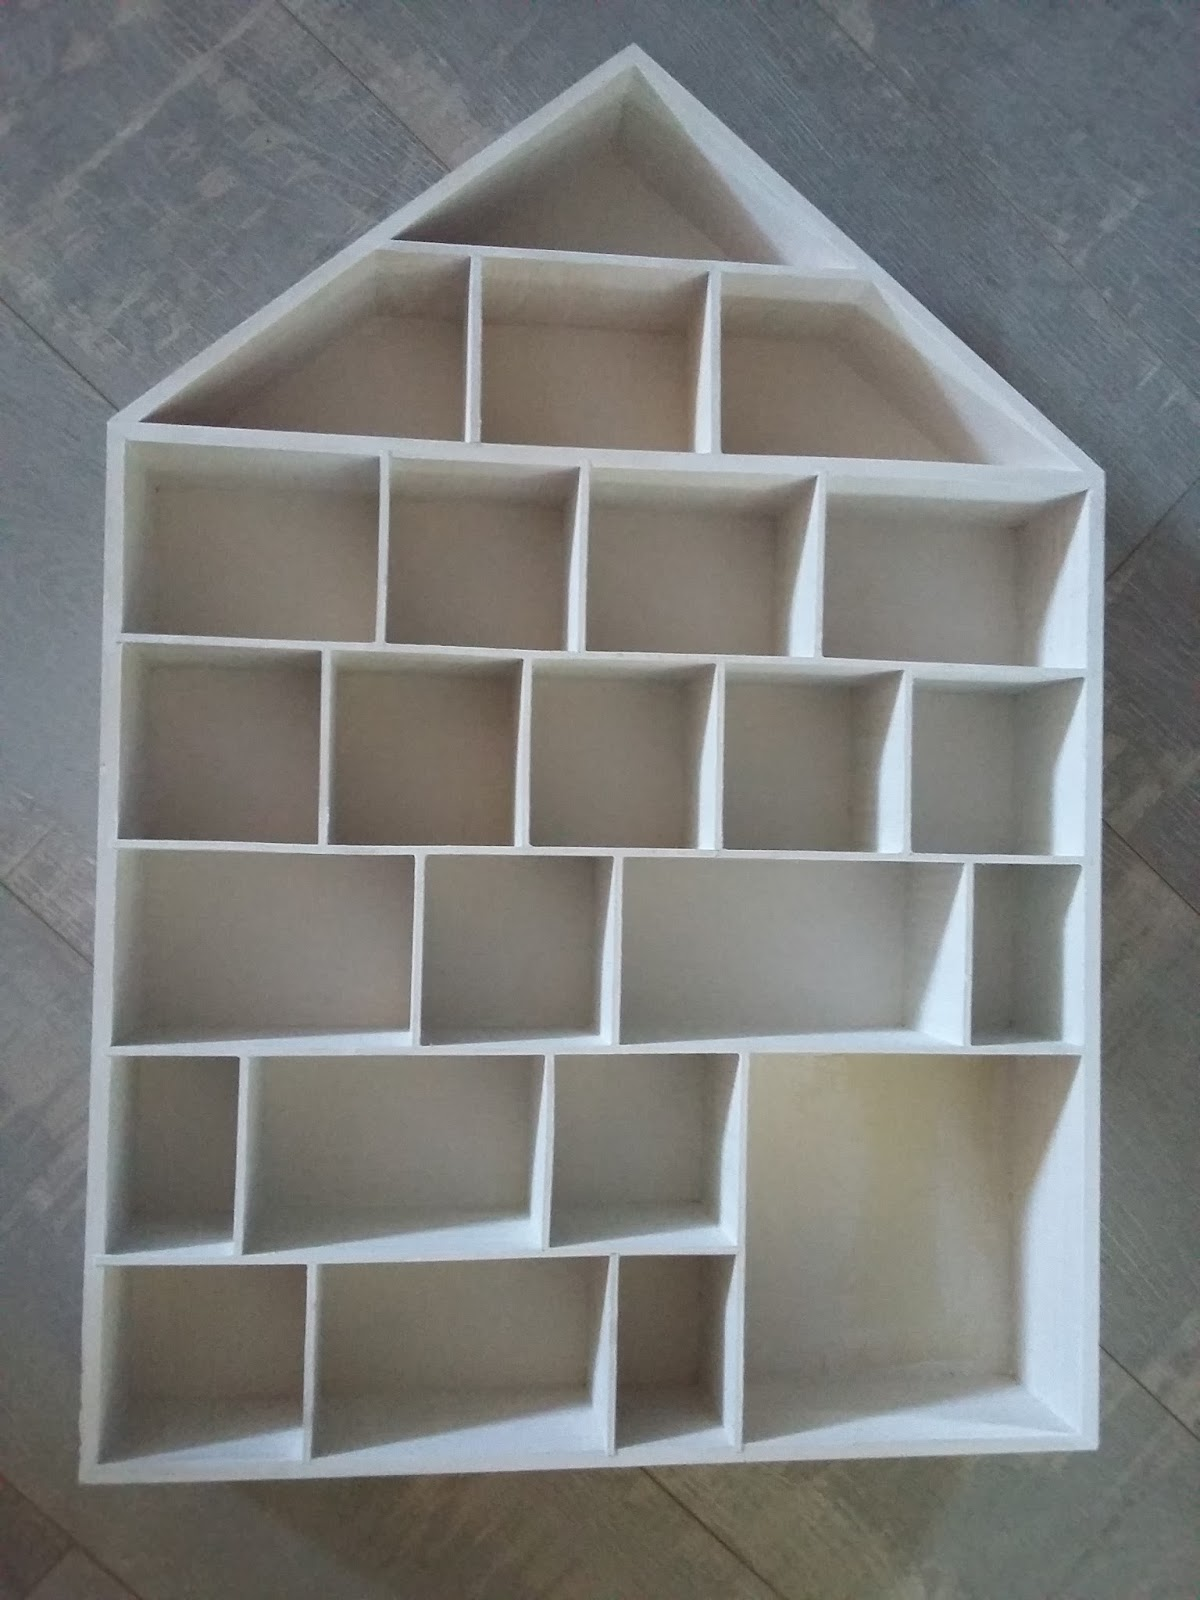 bricolage de l 39 id e la r alisation calendrier de l 39 avent original. Black Bedroom Furniture Sets. Home Design Ideas